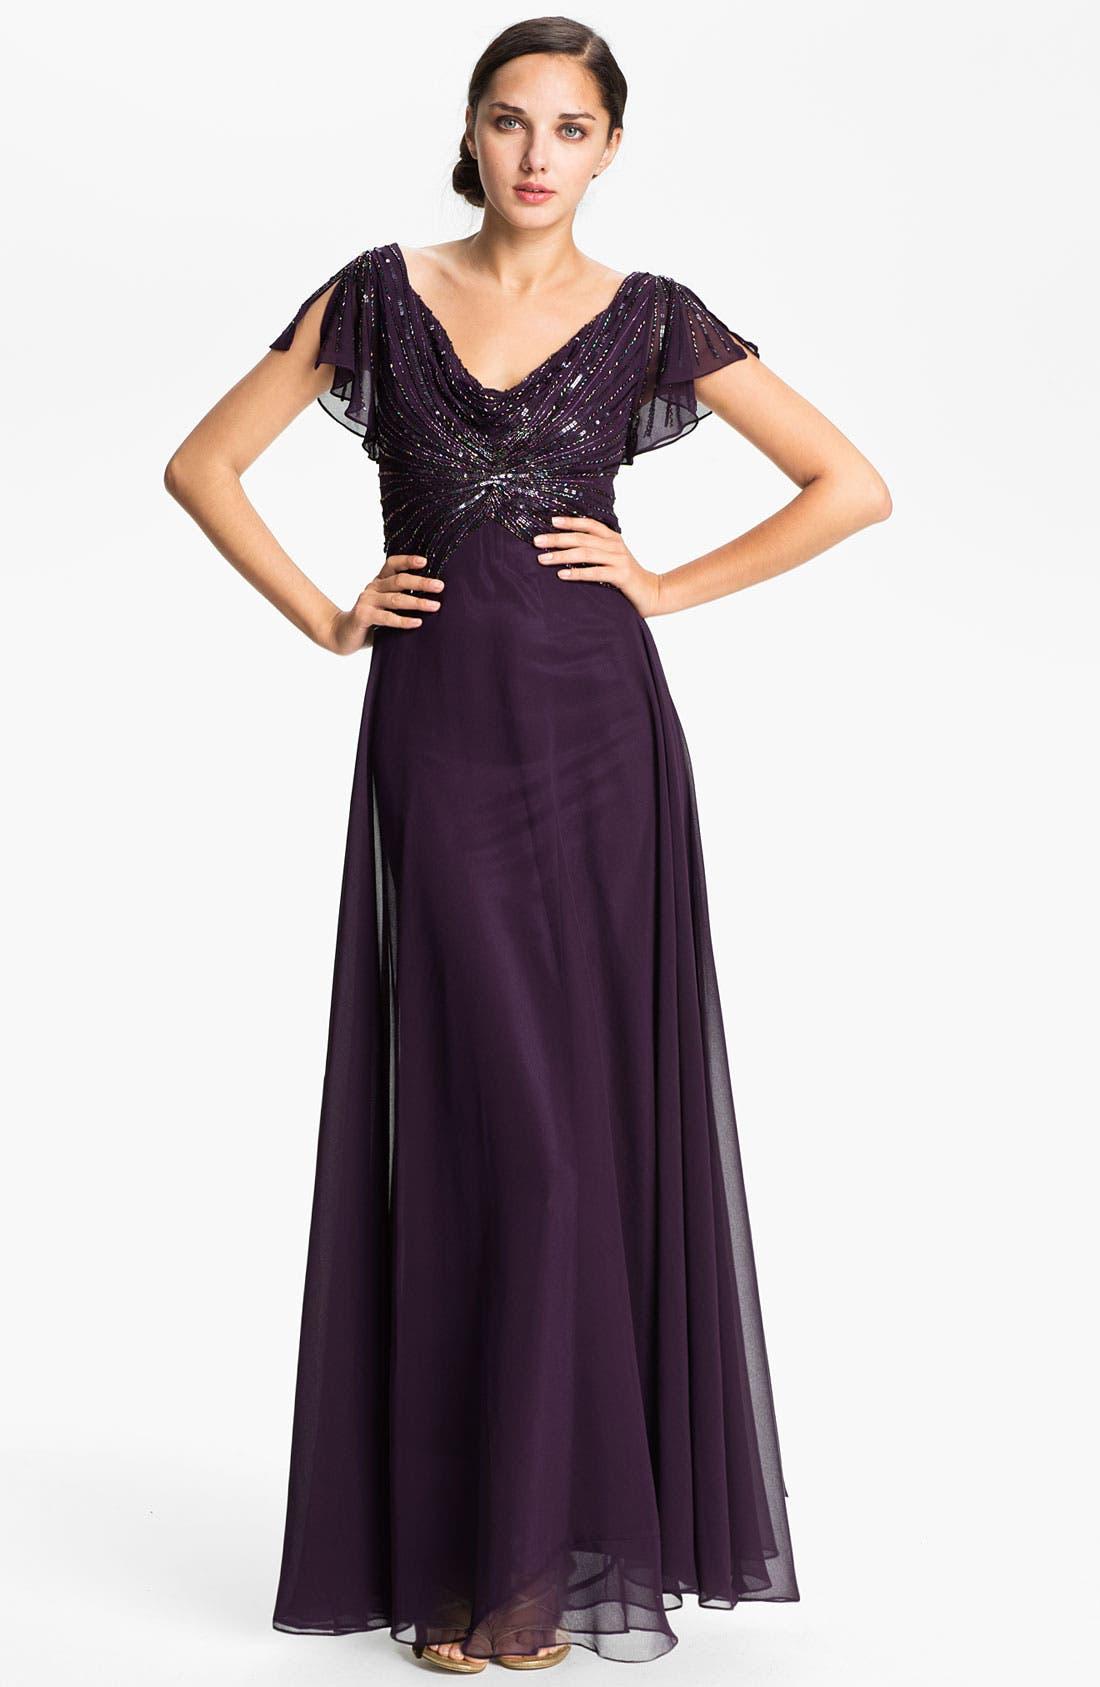 Alternate Image 1 Selected - J Kara Embellished Drape Bodice Chiffon Gown